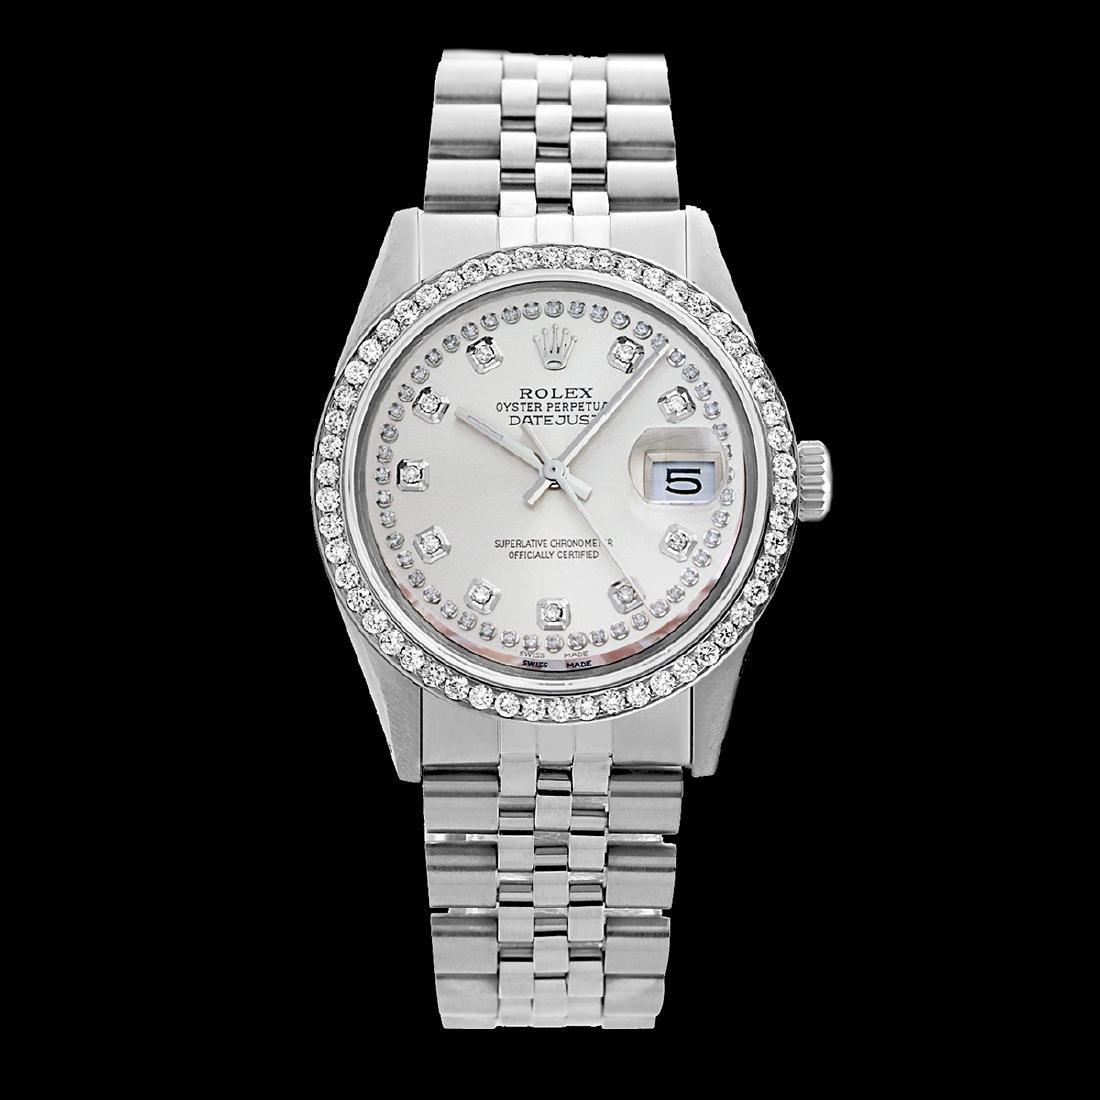 Rolex Men's Stainless Steel, QuickSet, Diamond Dial & - 2